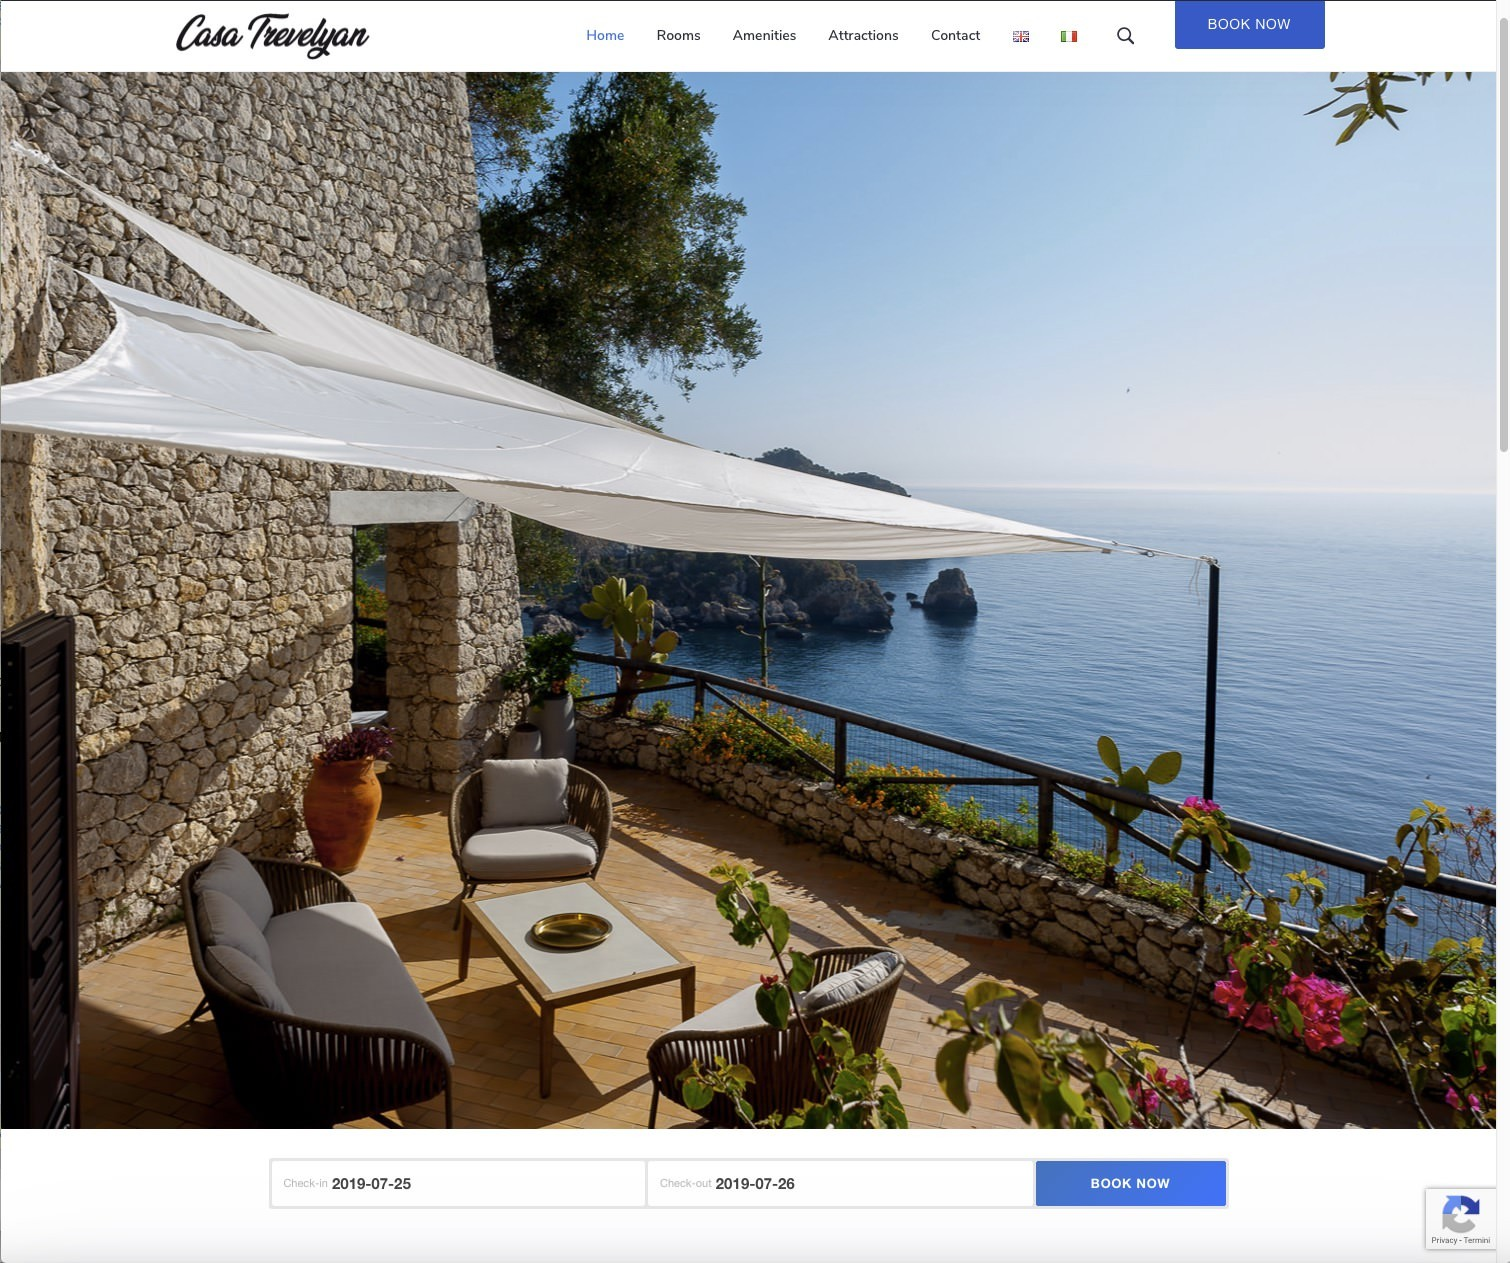 Casa-Trevelyan-isola-bella-website